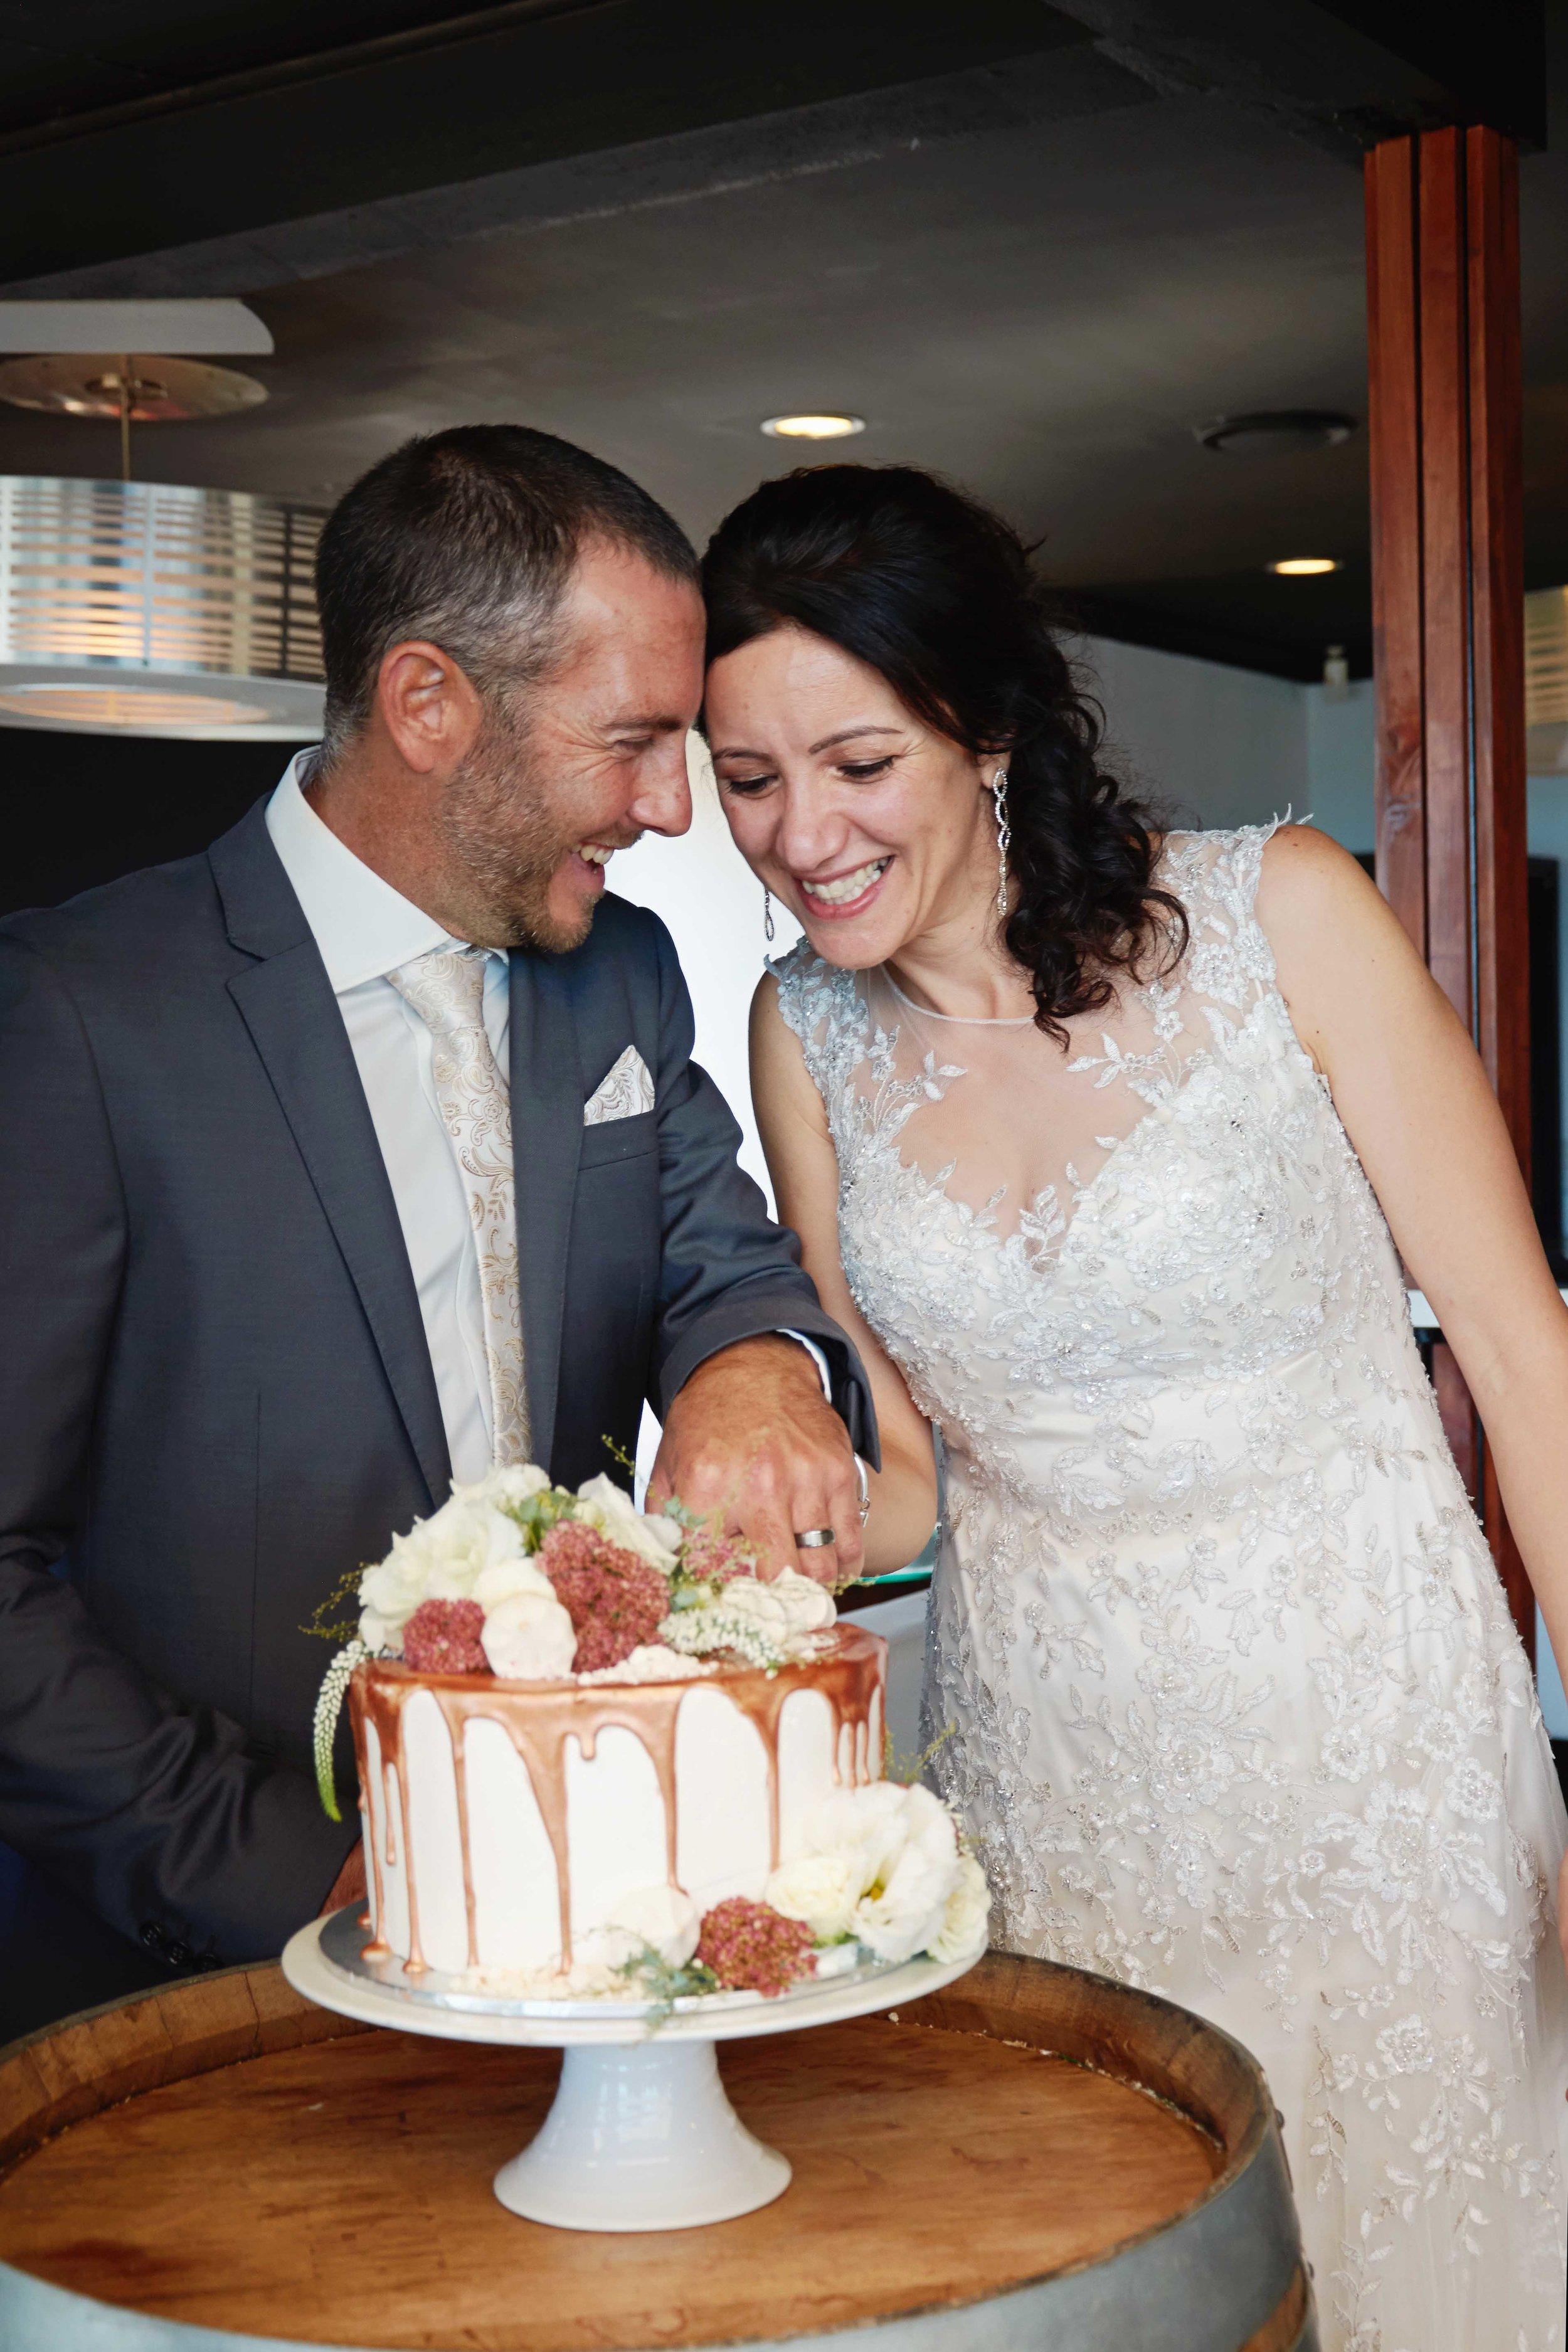 sorrento-wedding-photography-all-smiles-marissa-jade-photography-103.jpg